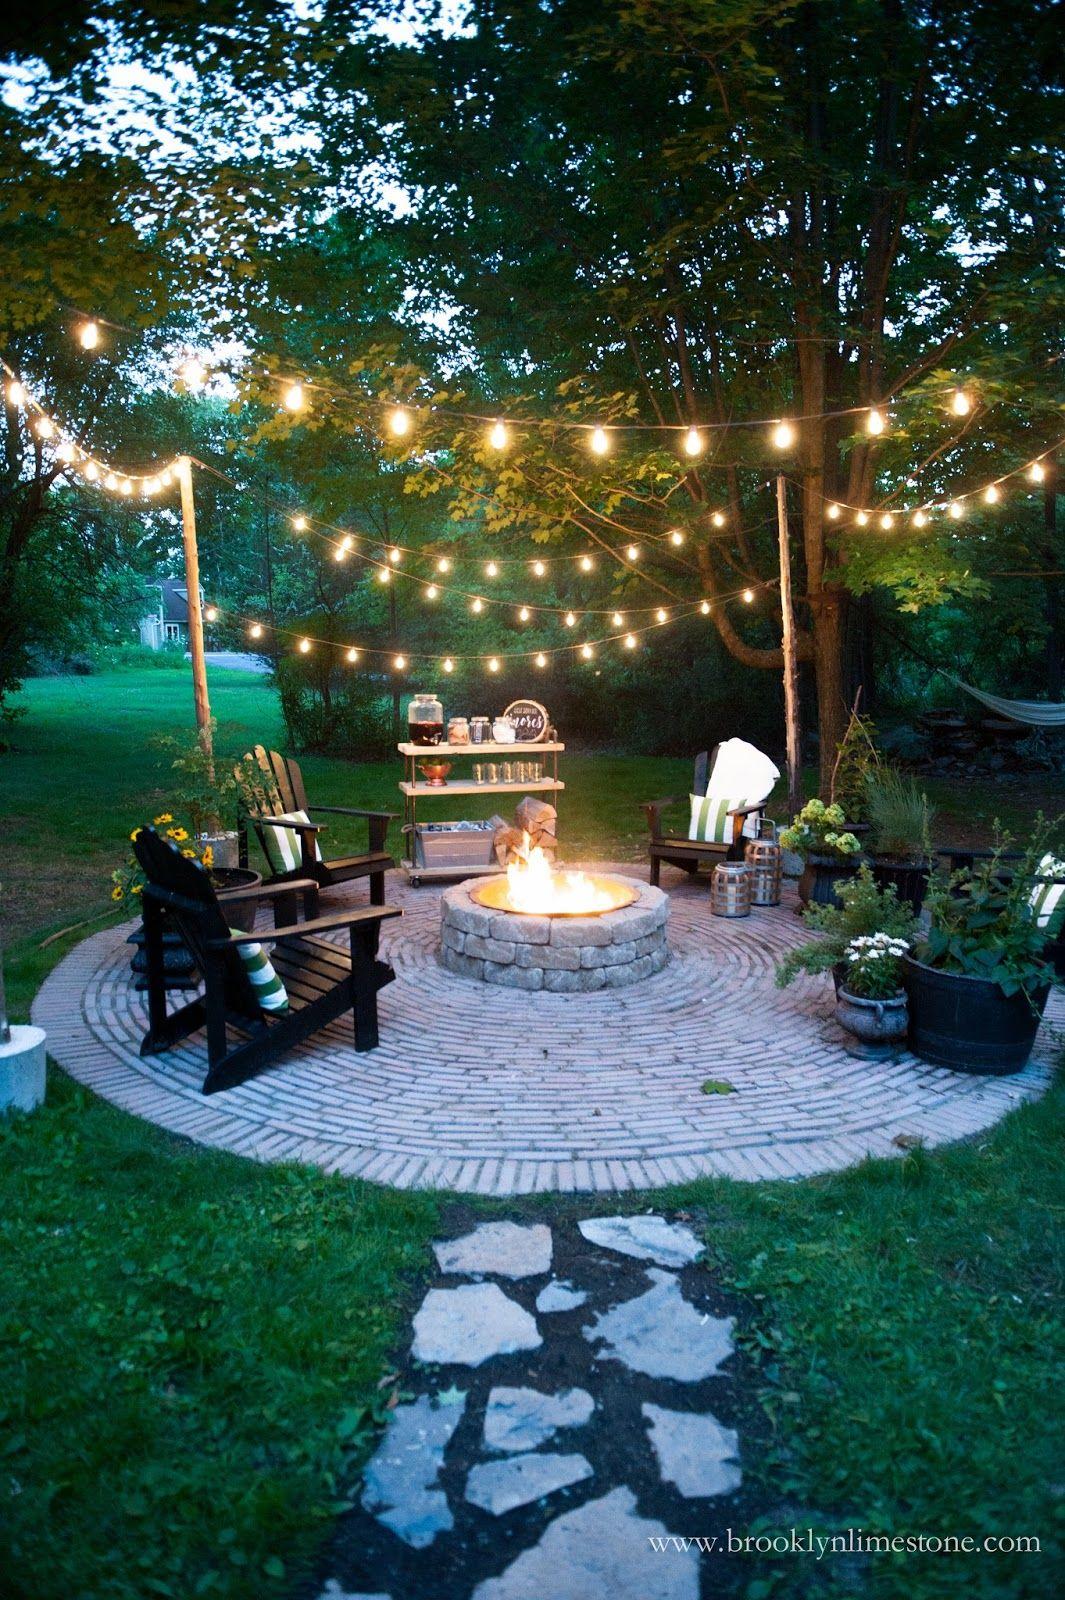 brooklyn limestone fall friendly ways to keep your patio party